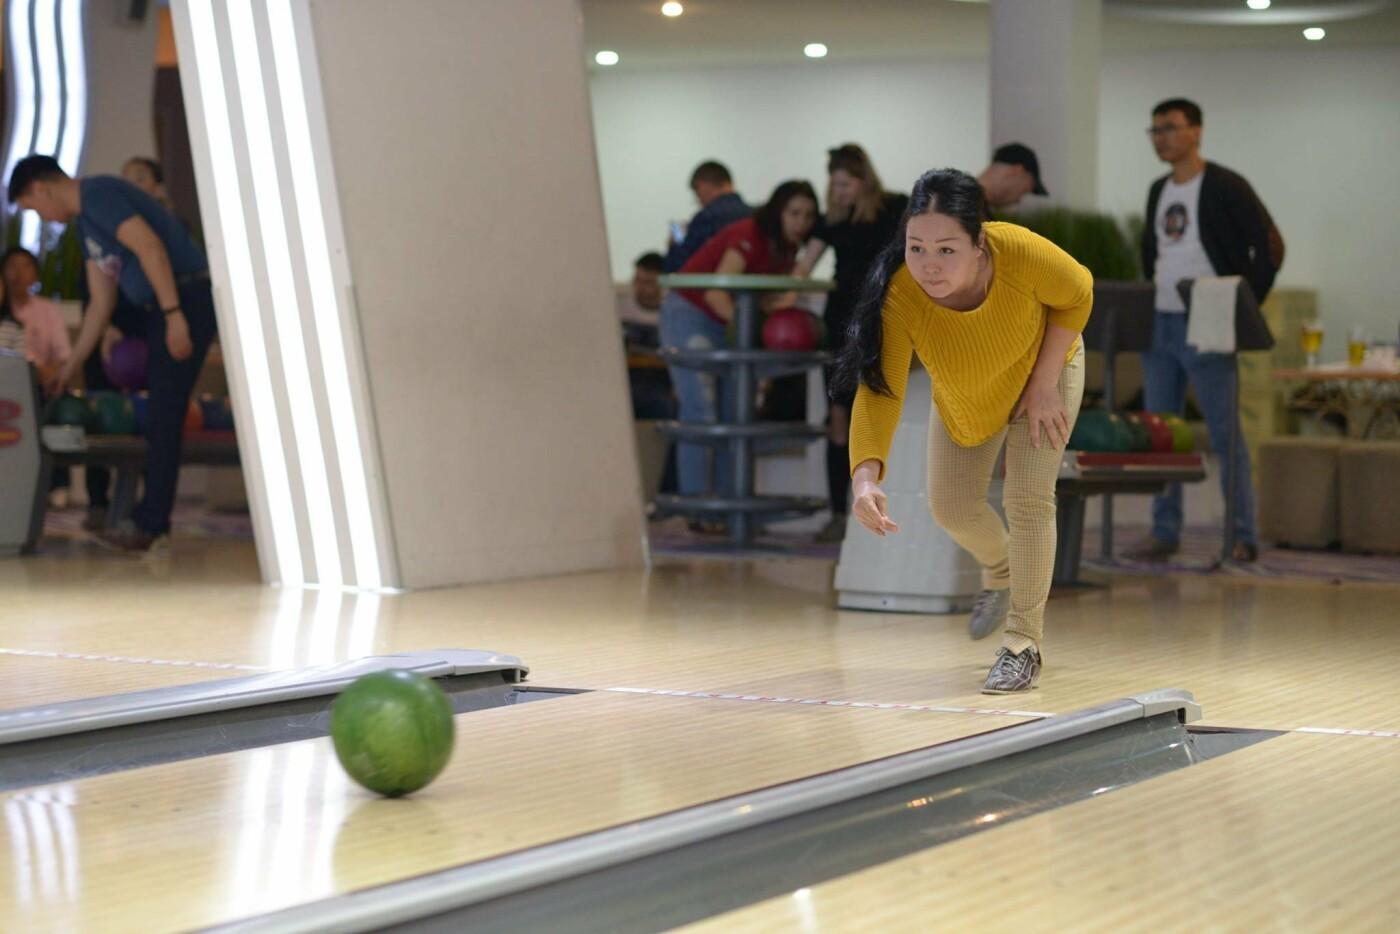 II турнир по боулингу среди журналистов прошел в Алматы (ФОТО), фото-3